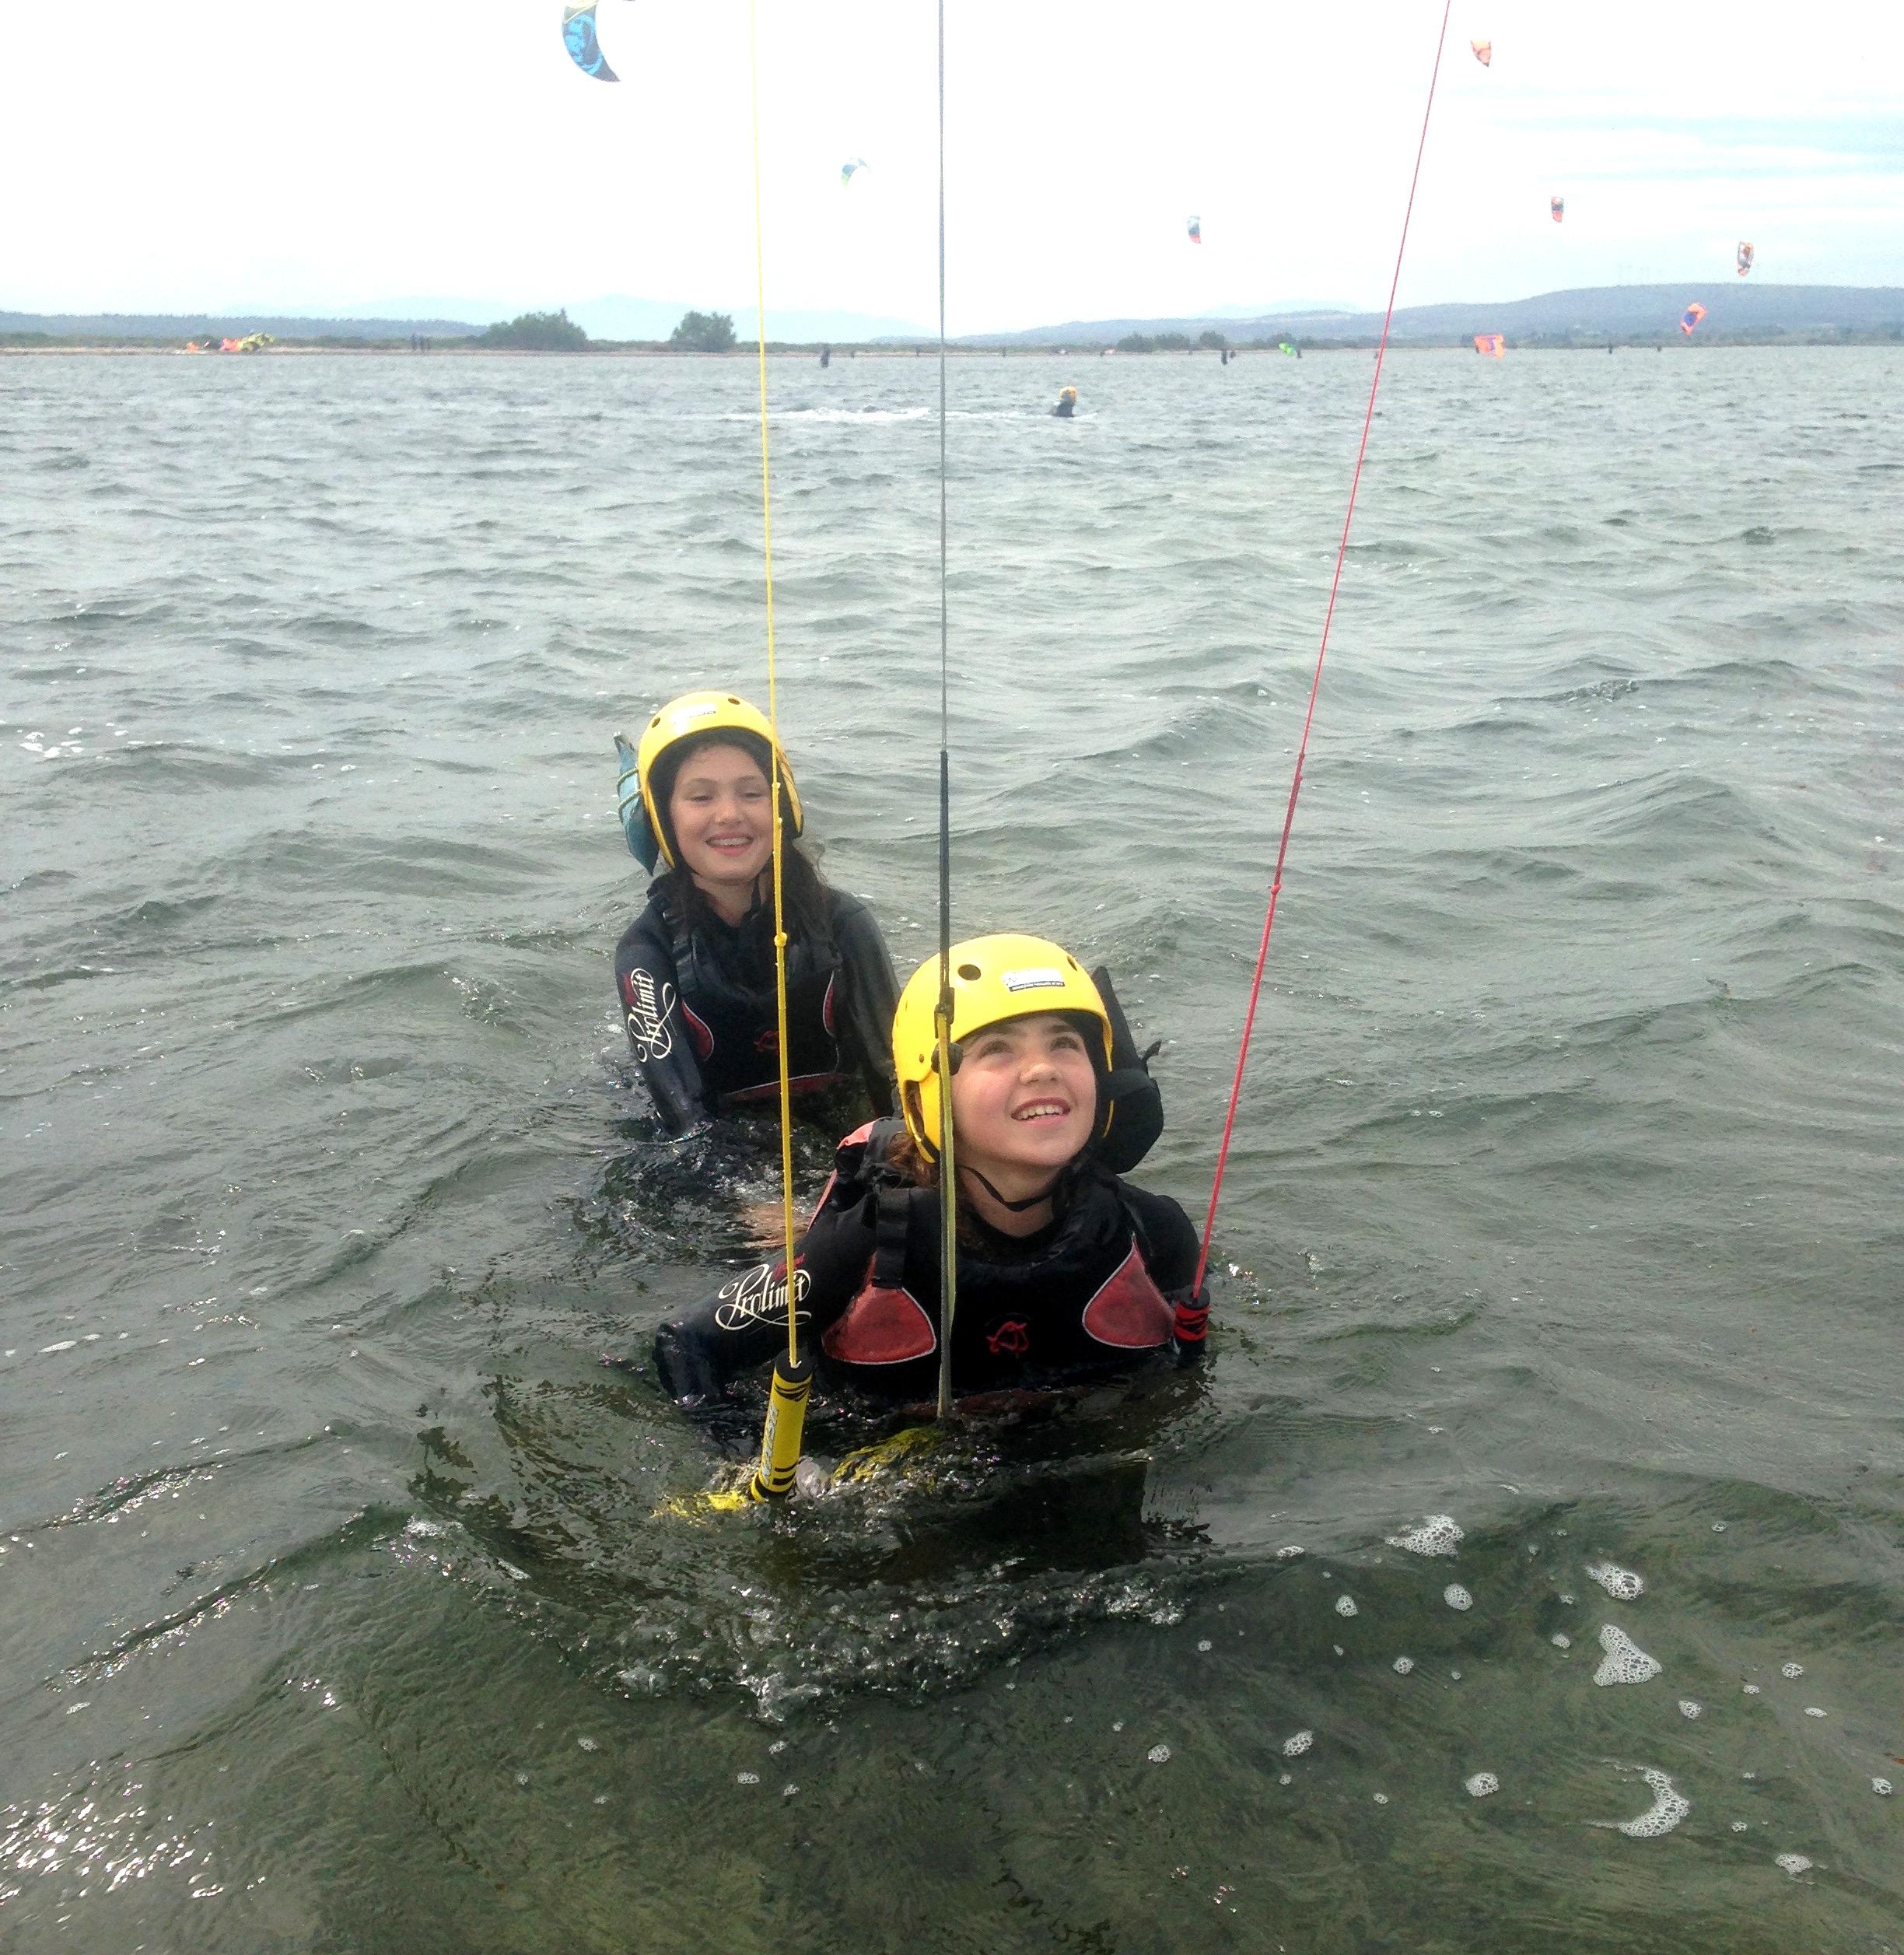 Débuter le kitesurf en 5 étapes